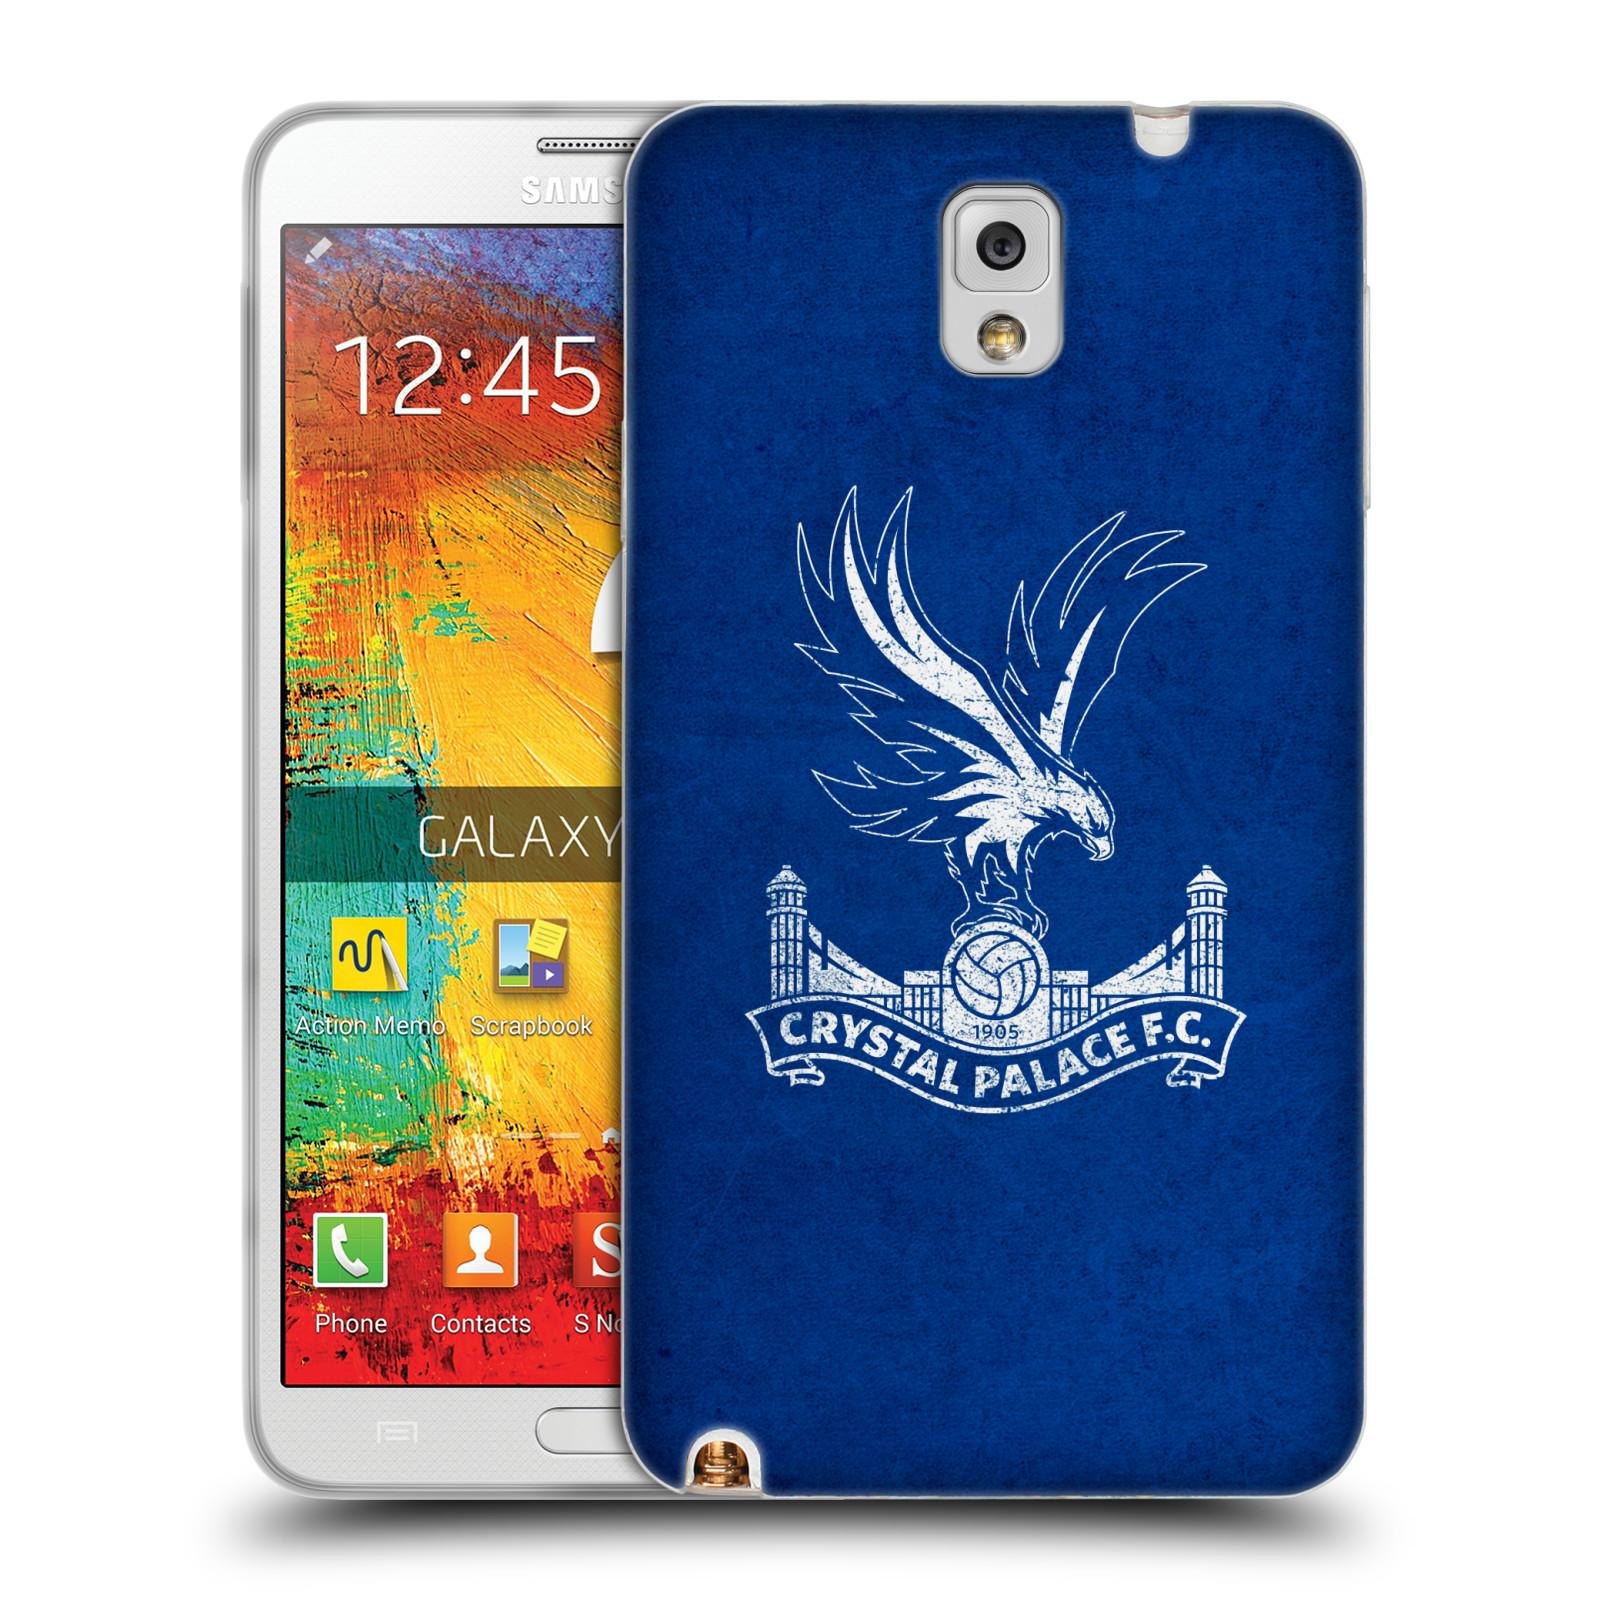 Cresta-oficial-Crystal-Palace-FC-2017-18-amp-Gel-caso-patron-para-telefonos-Samsung-2